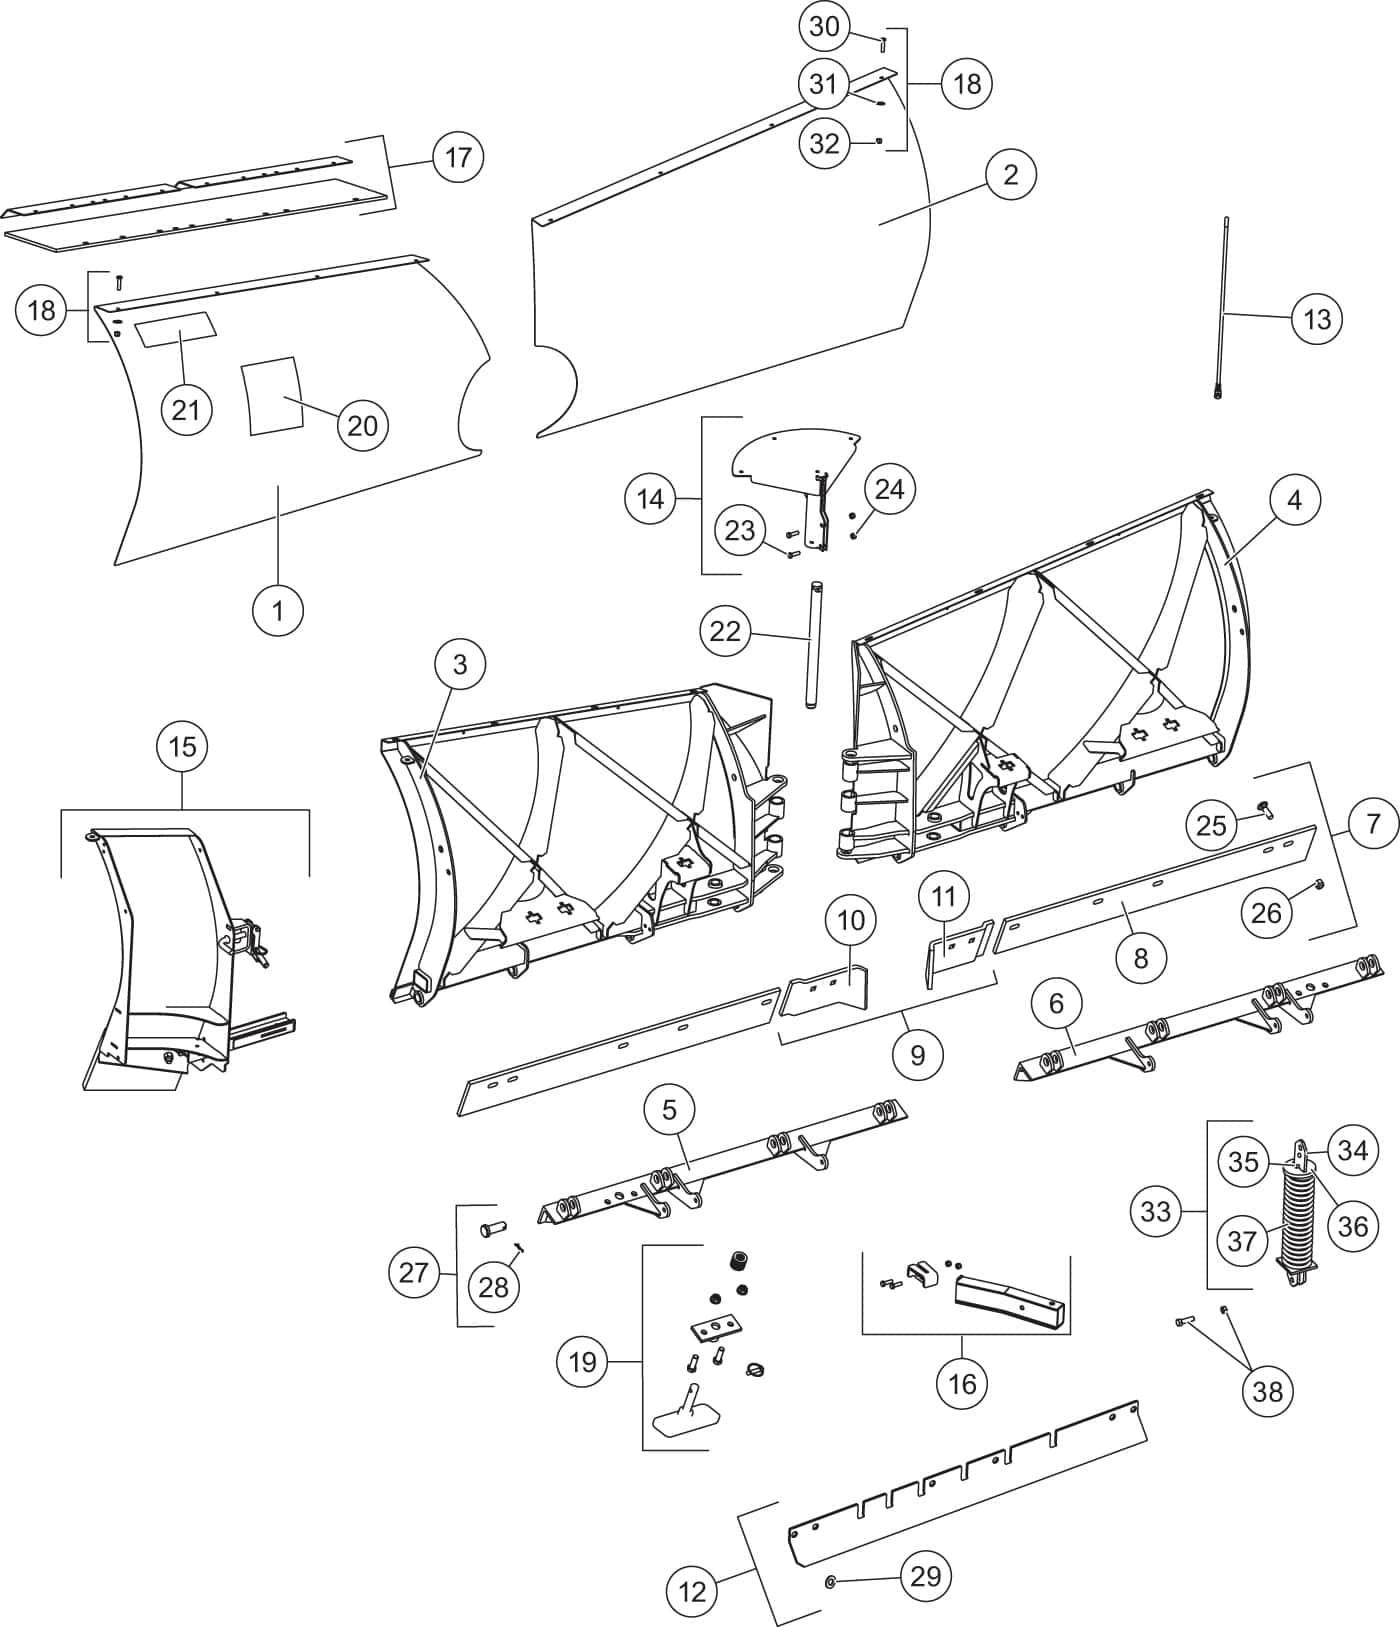 Boss Rt3 Power V Snow Plow Parts Diagram On Boss Plow Parts Diagram